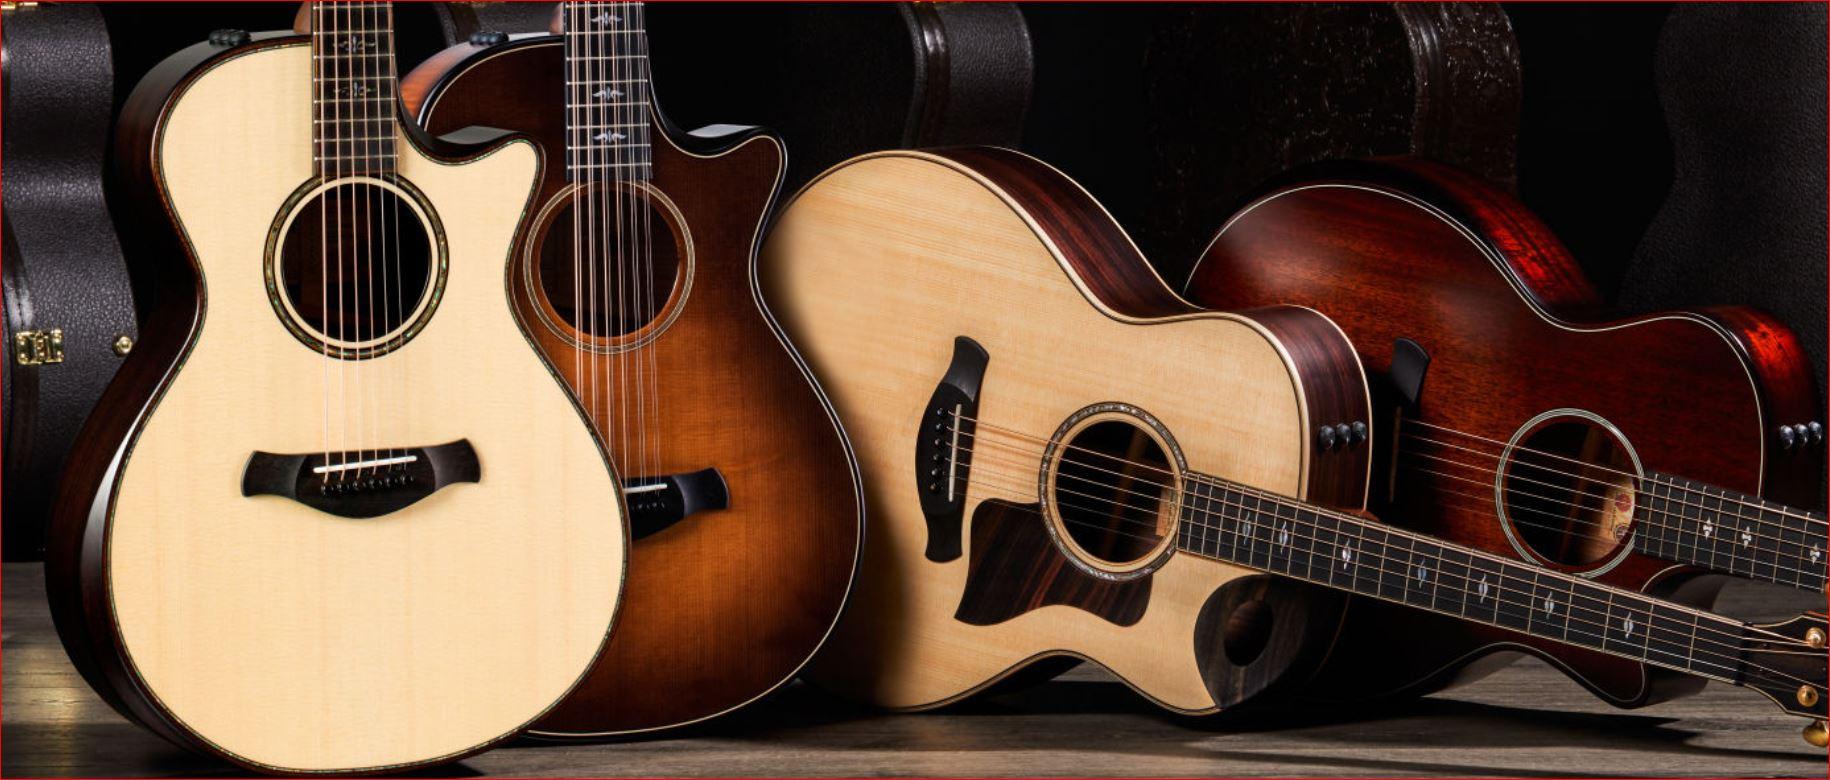 Martin Guitar Customer Opinion Survey